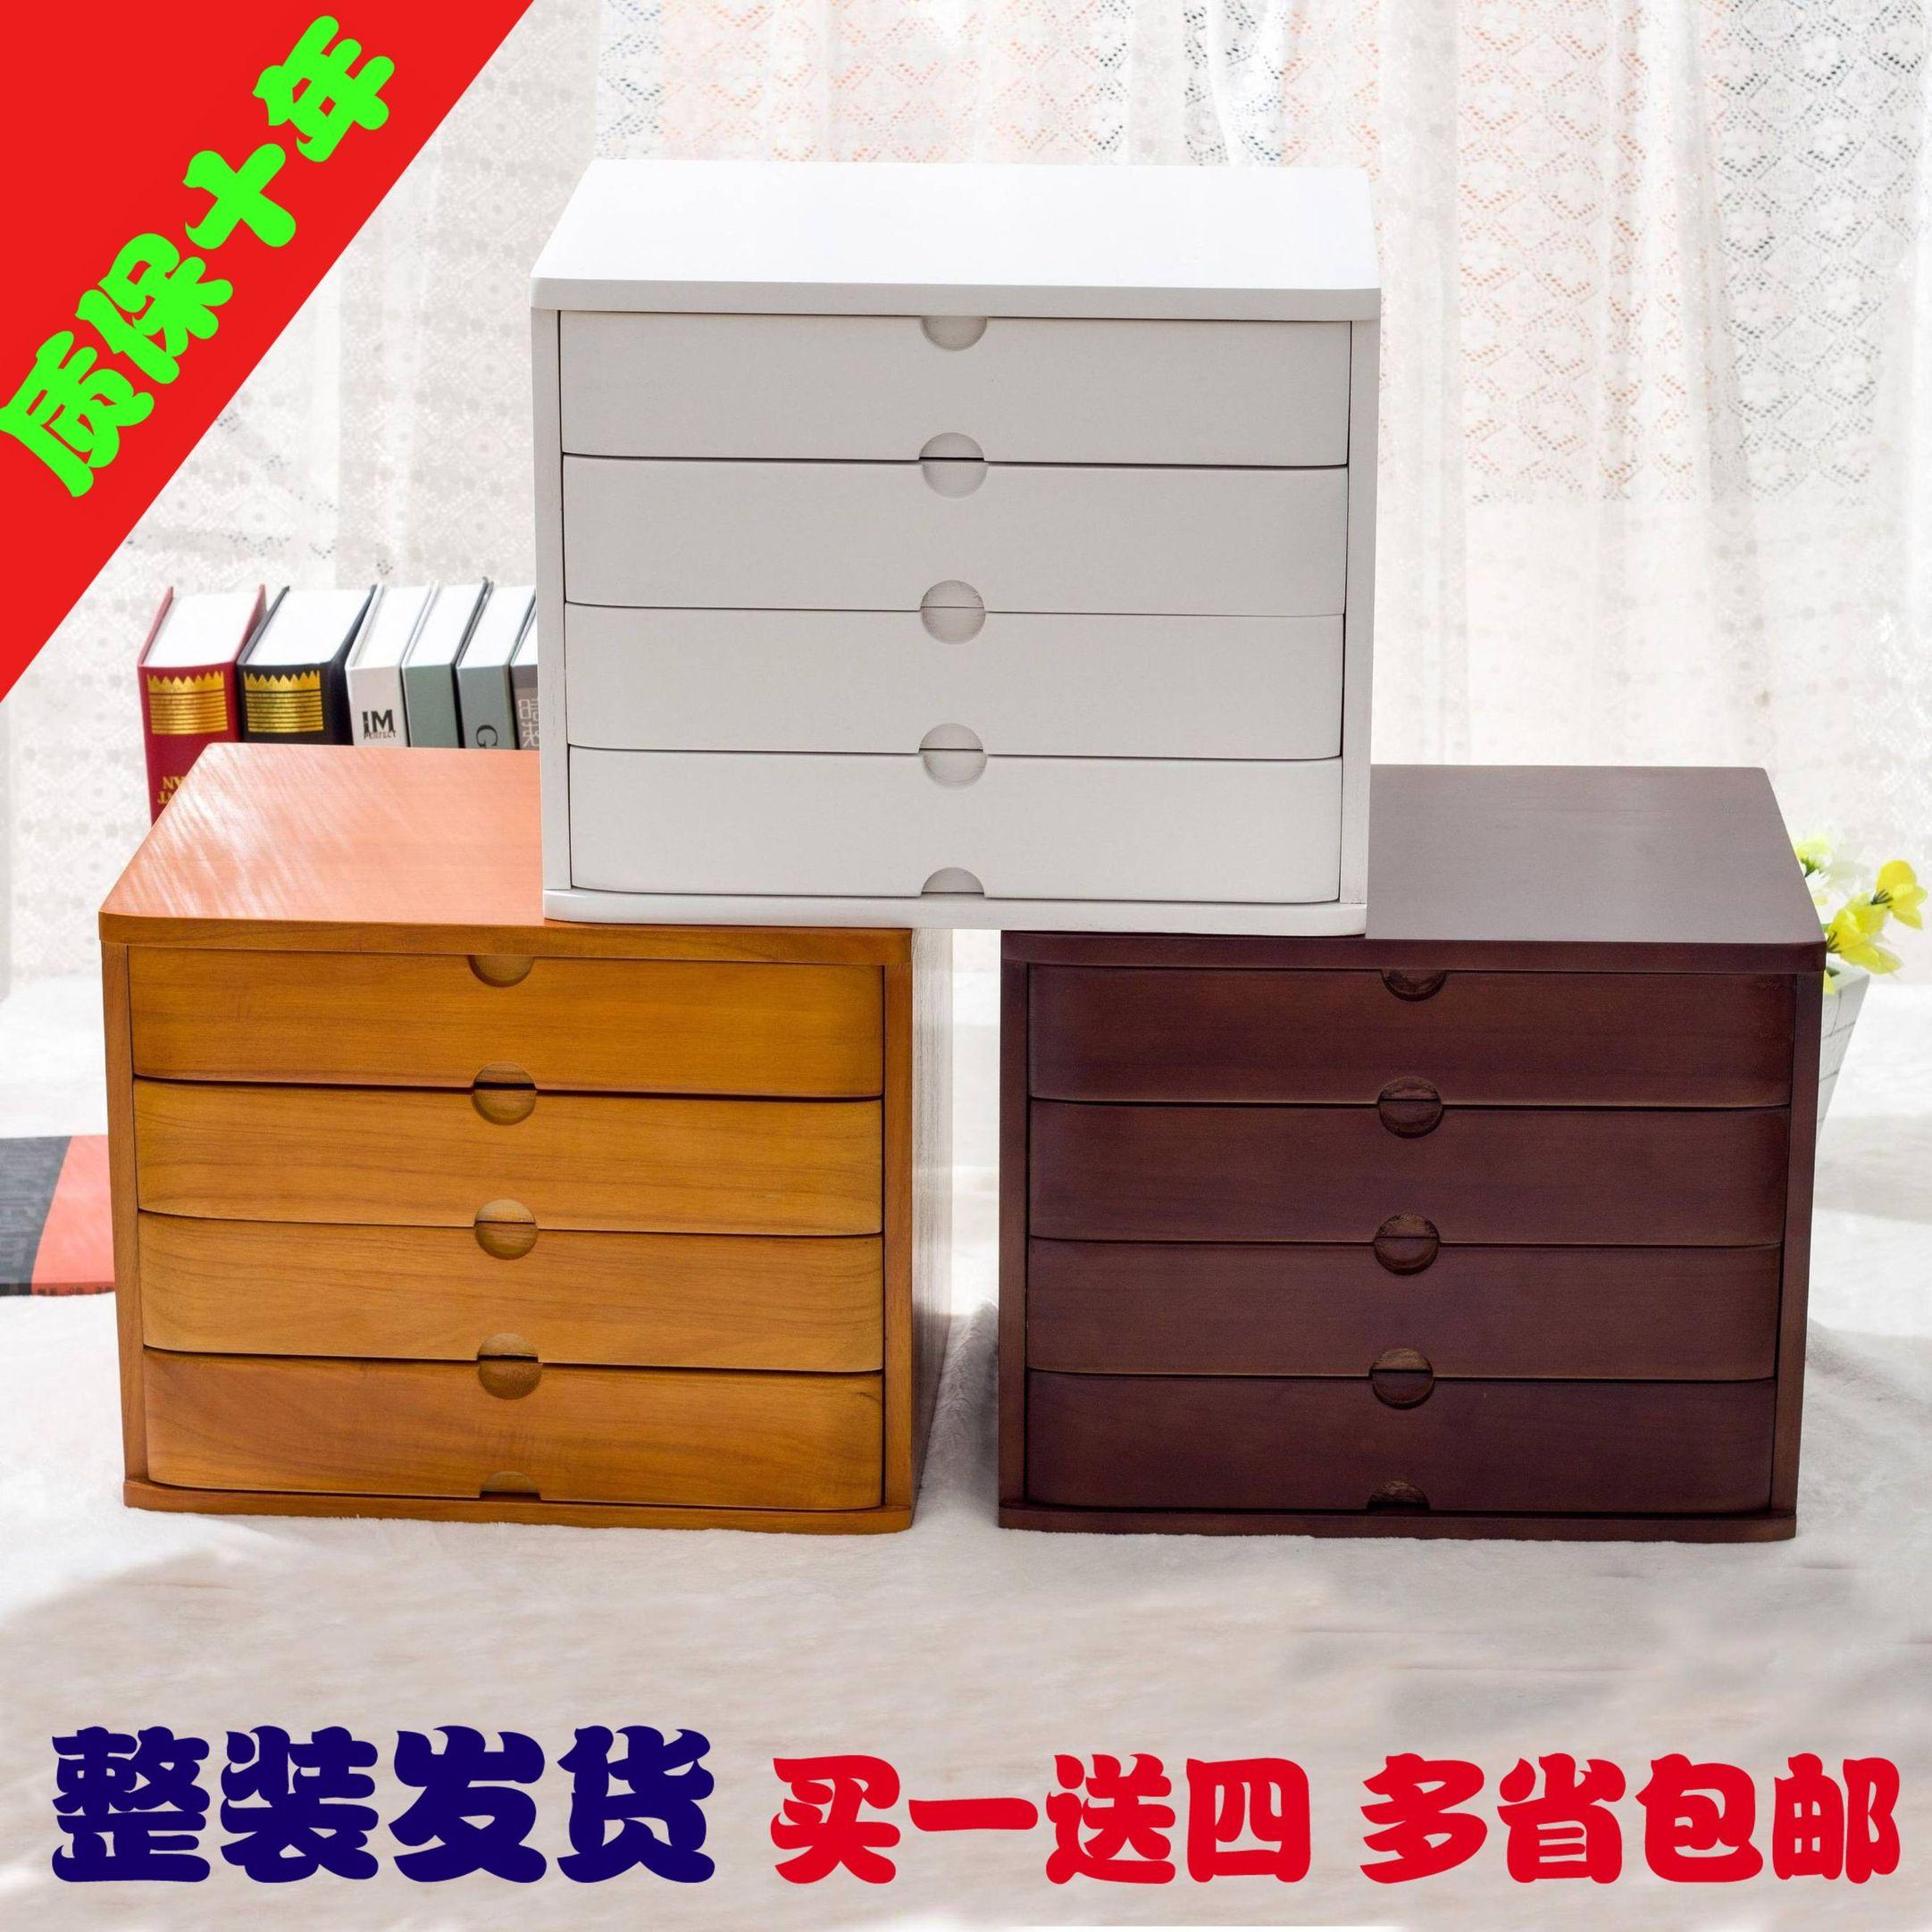 Office Makeup Organizer Desktop Debris Storage Box Real